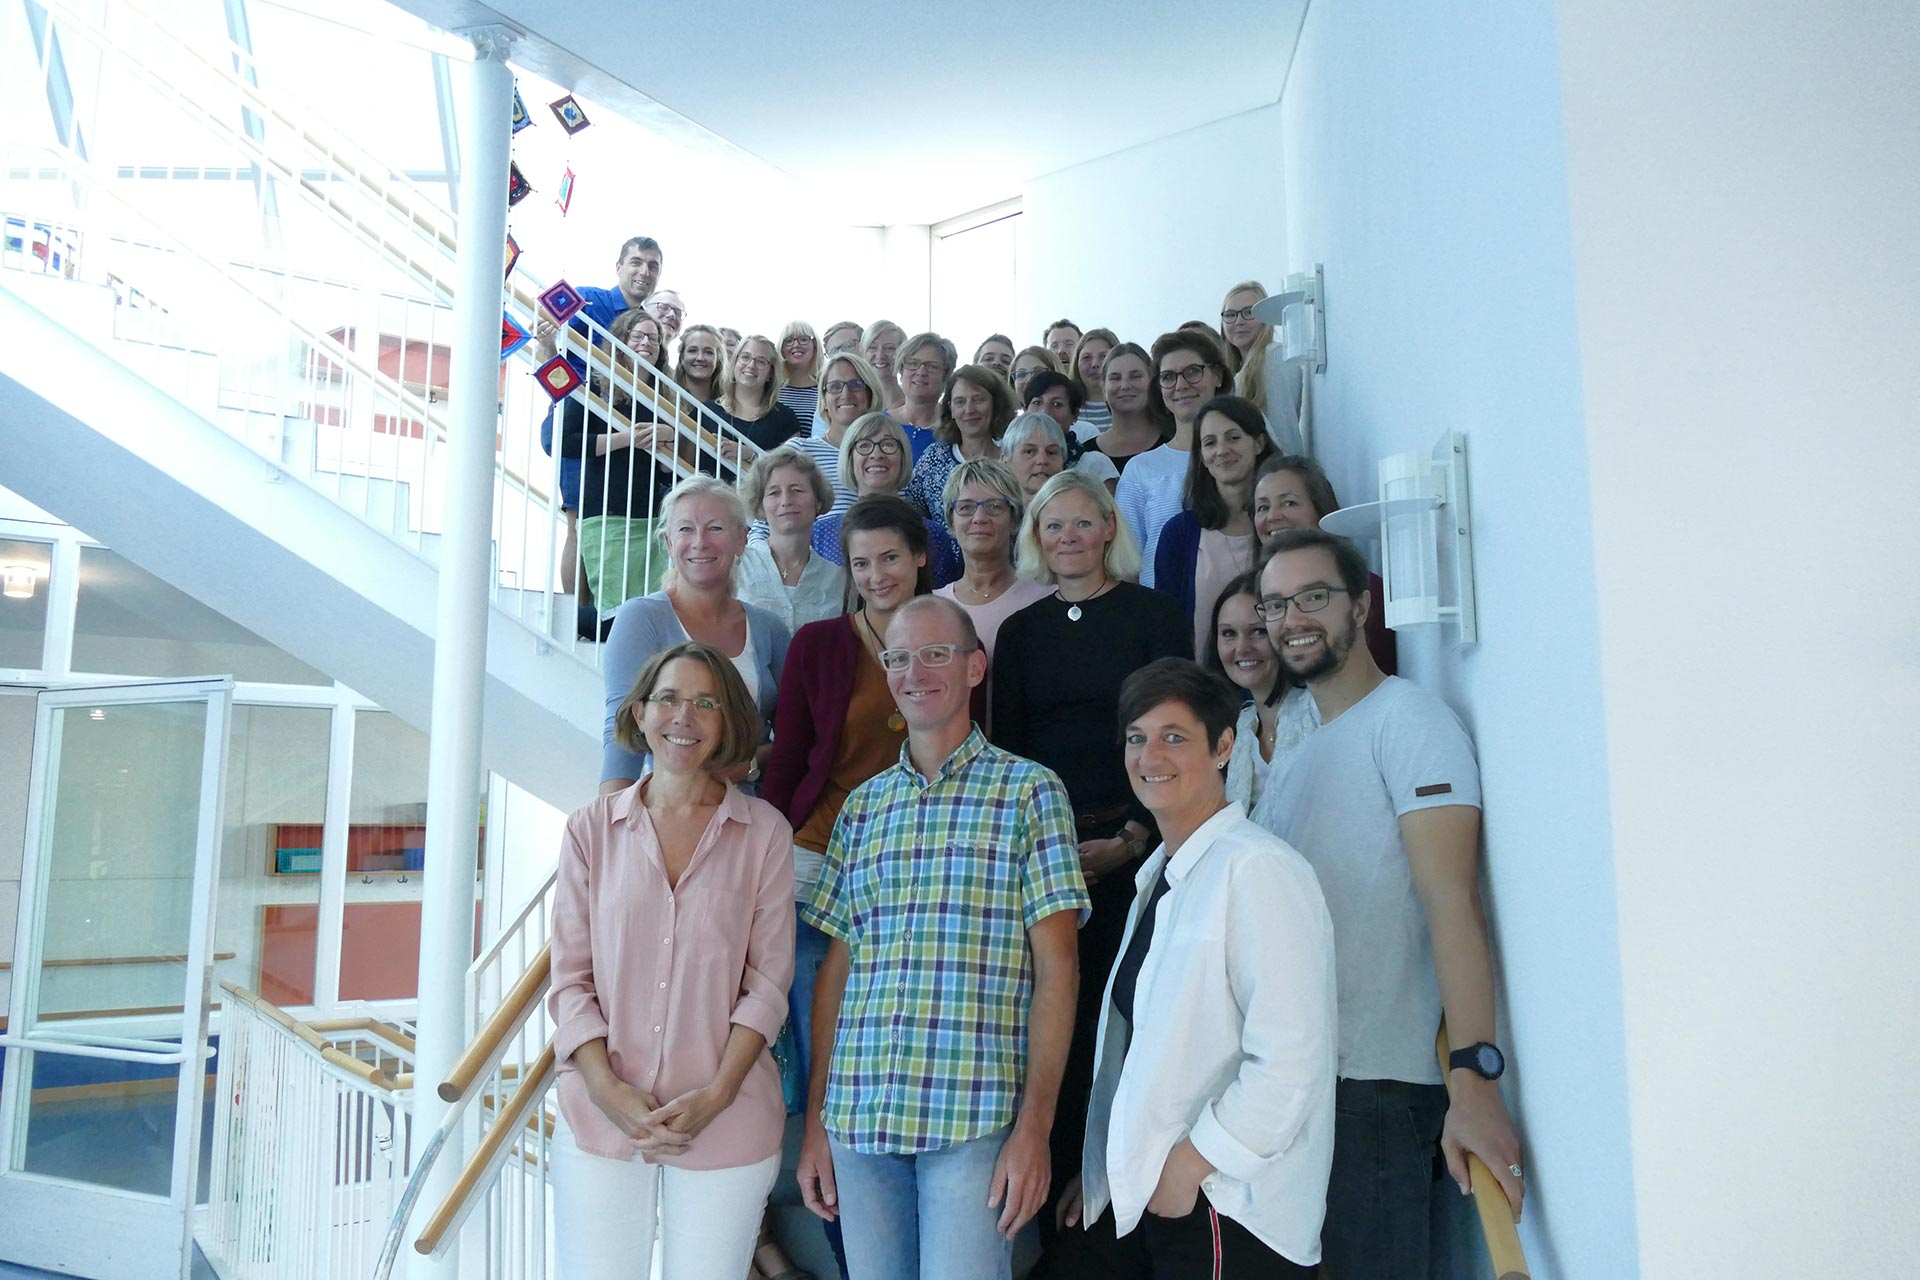 Lehrerkollegium Astrid Lindgren Schule Kempten Schuljahr 2018/2019